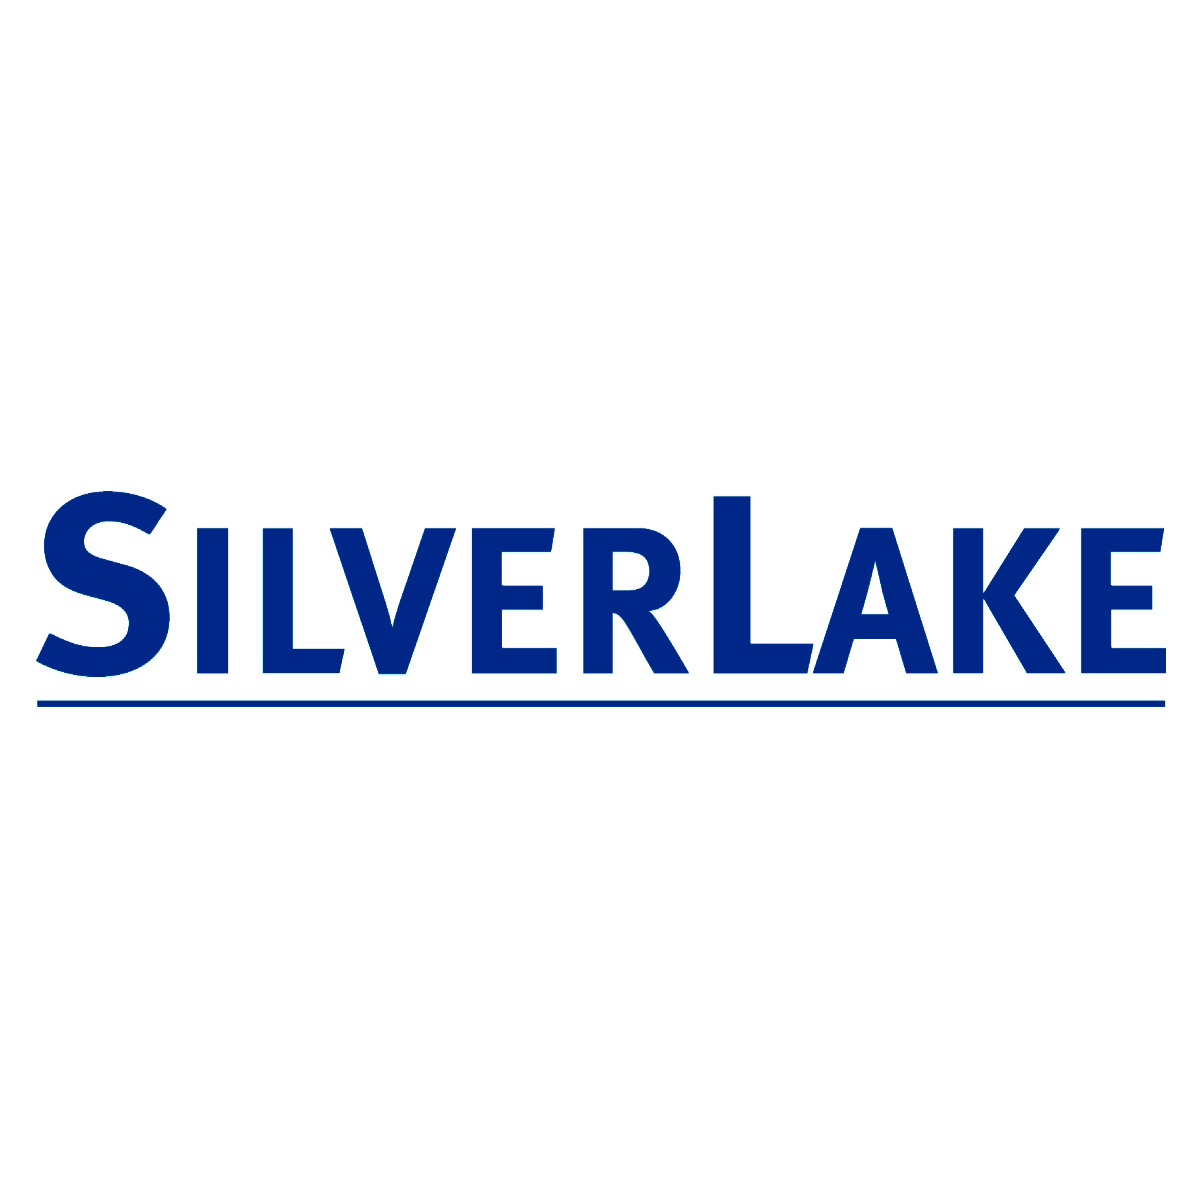 Silver Lake Logo - blue on a white background